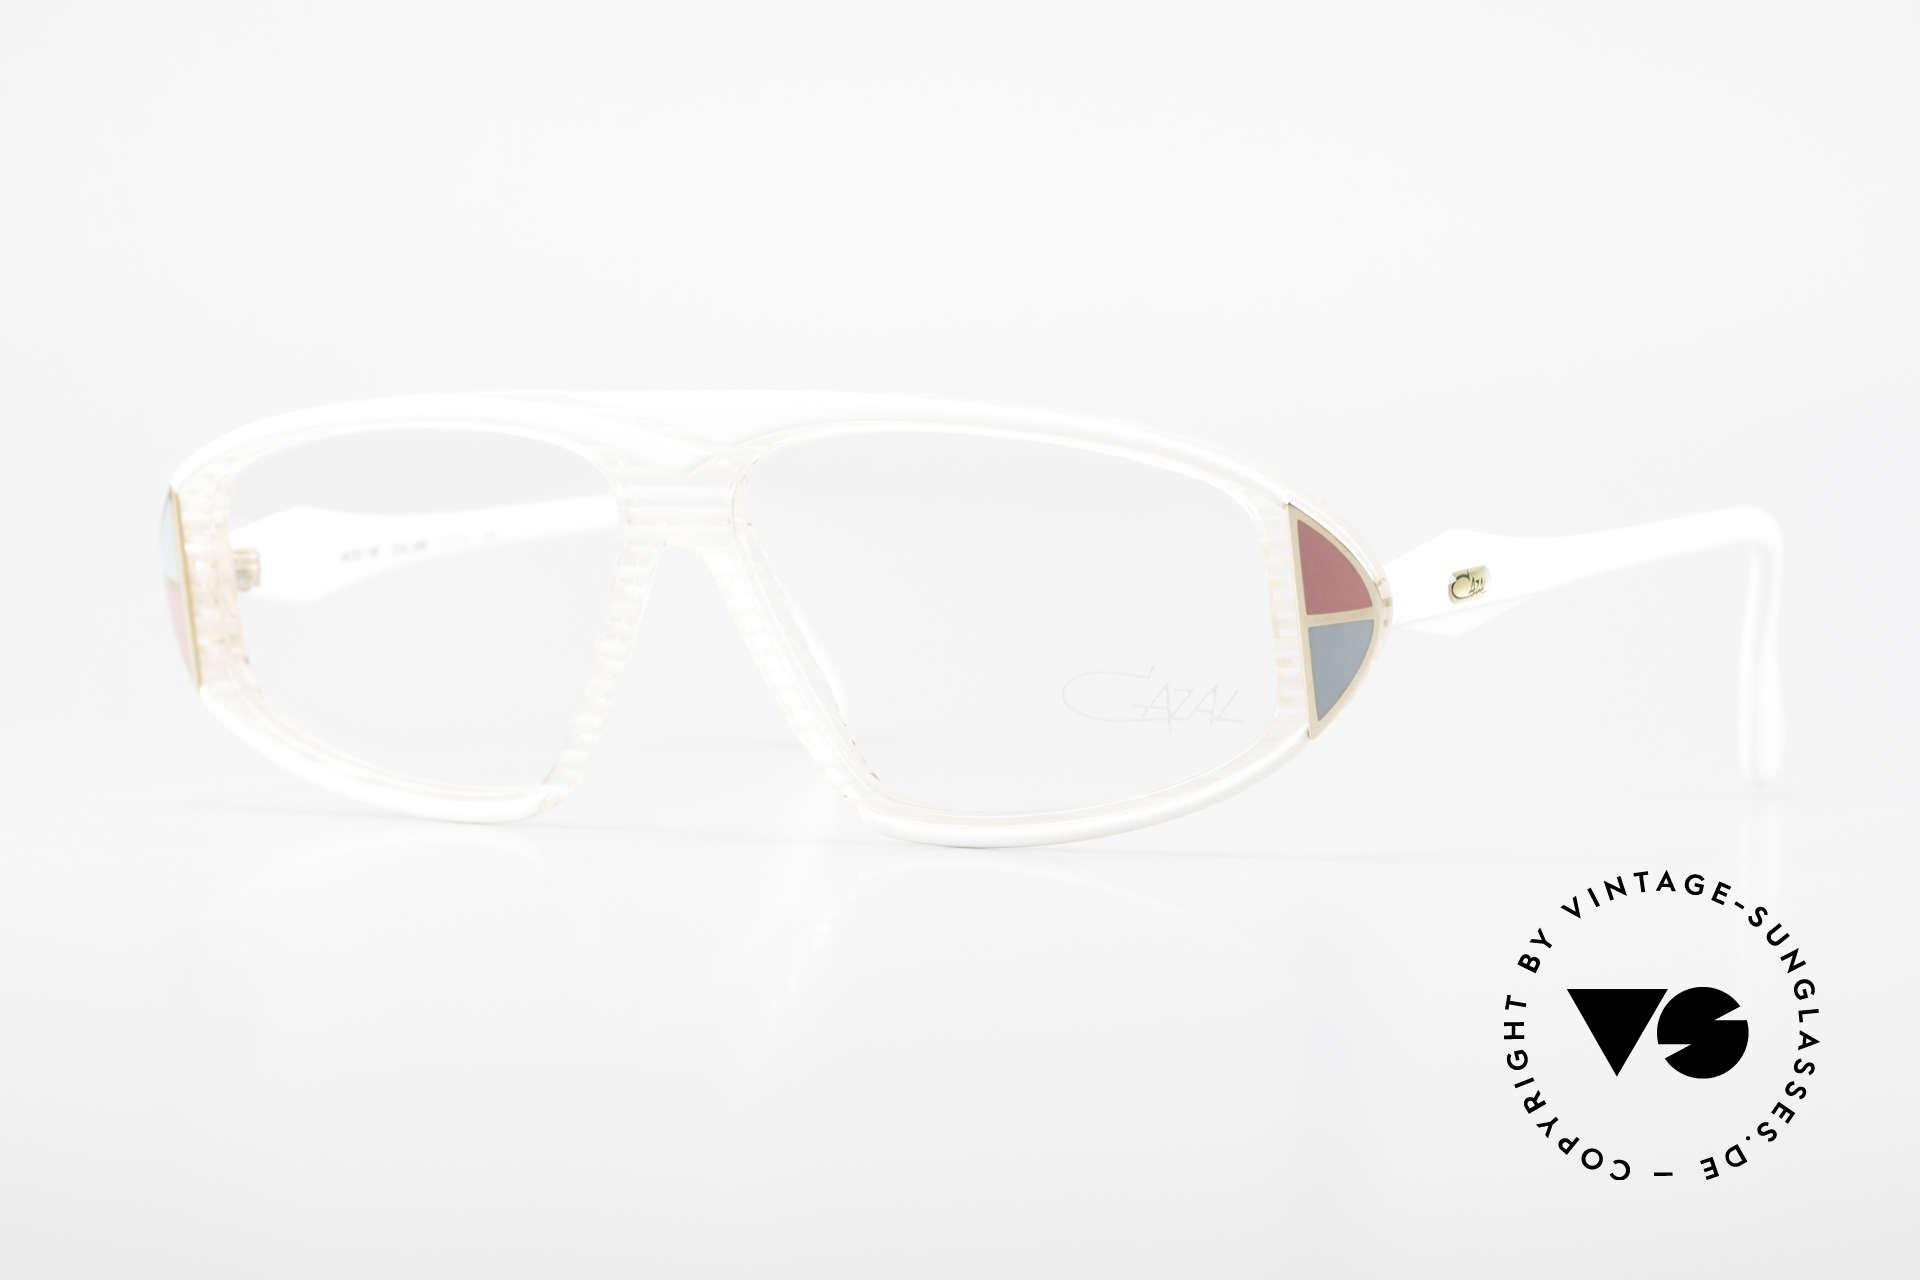 Cazal 187 80's Old School Eyeglasses, eye-catching vintage Cazal designer eyeglasses, Made for Men and Women